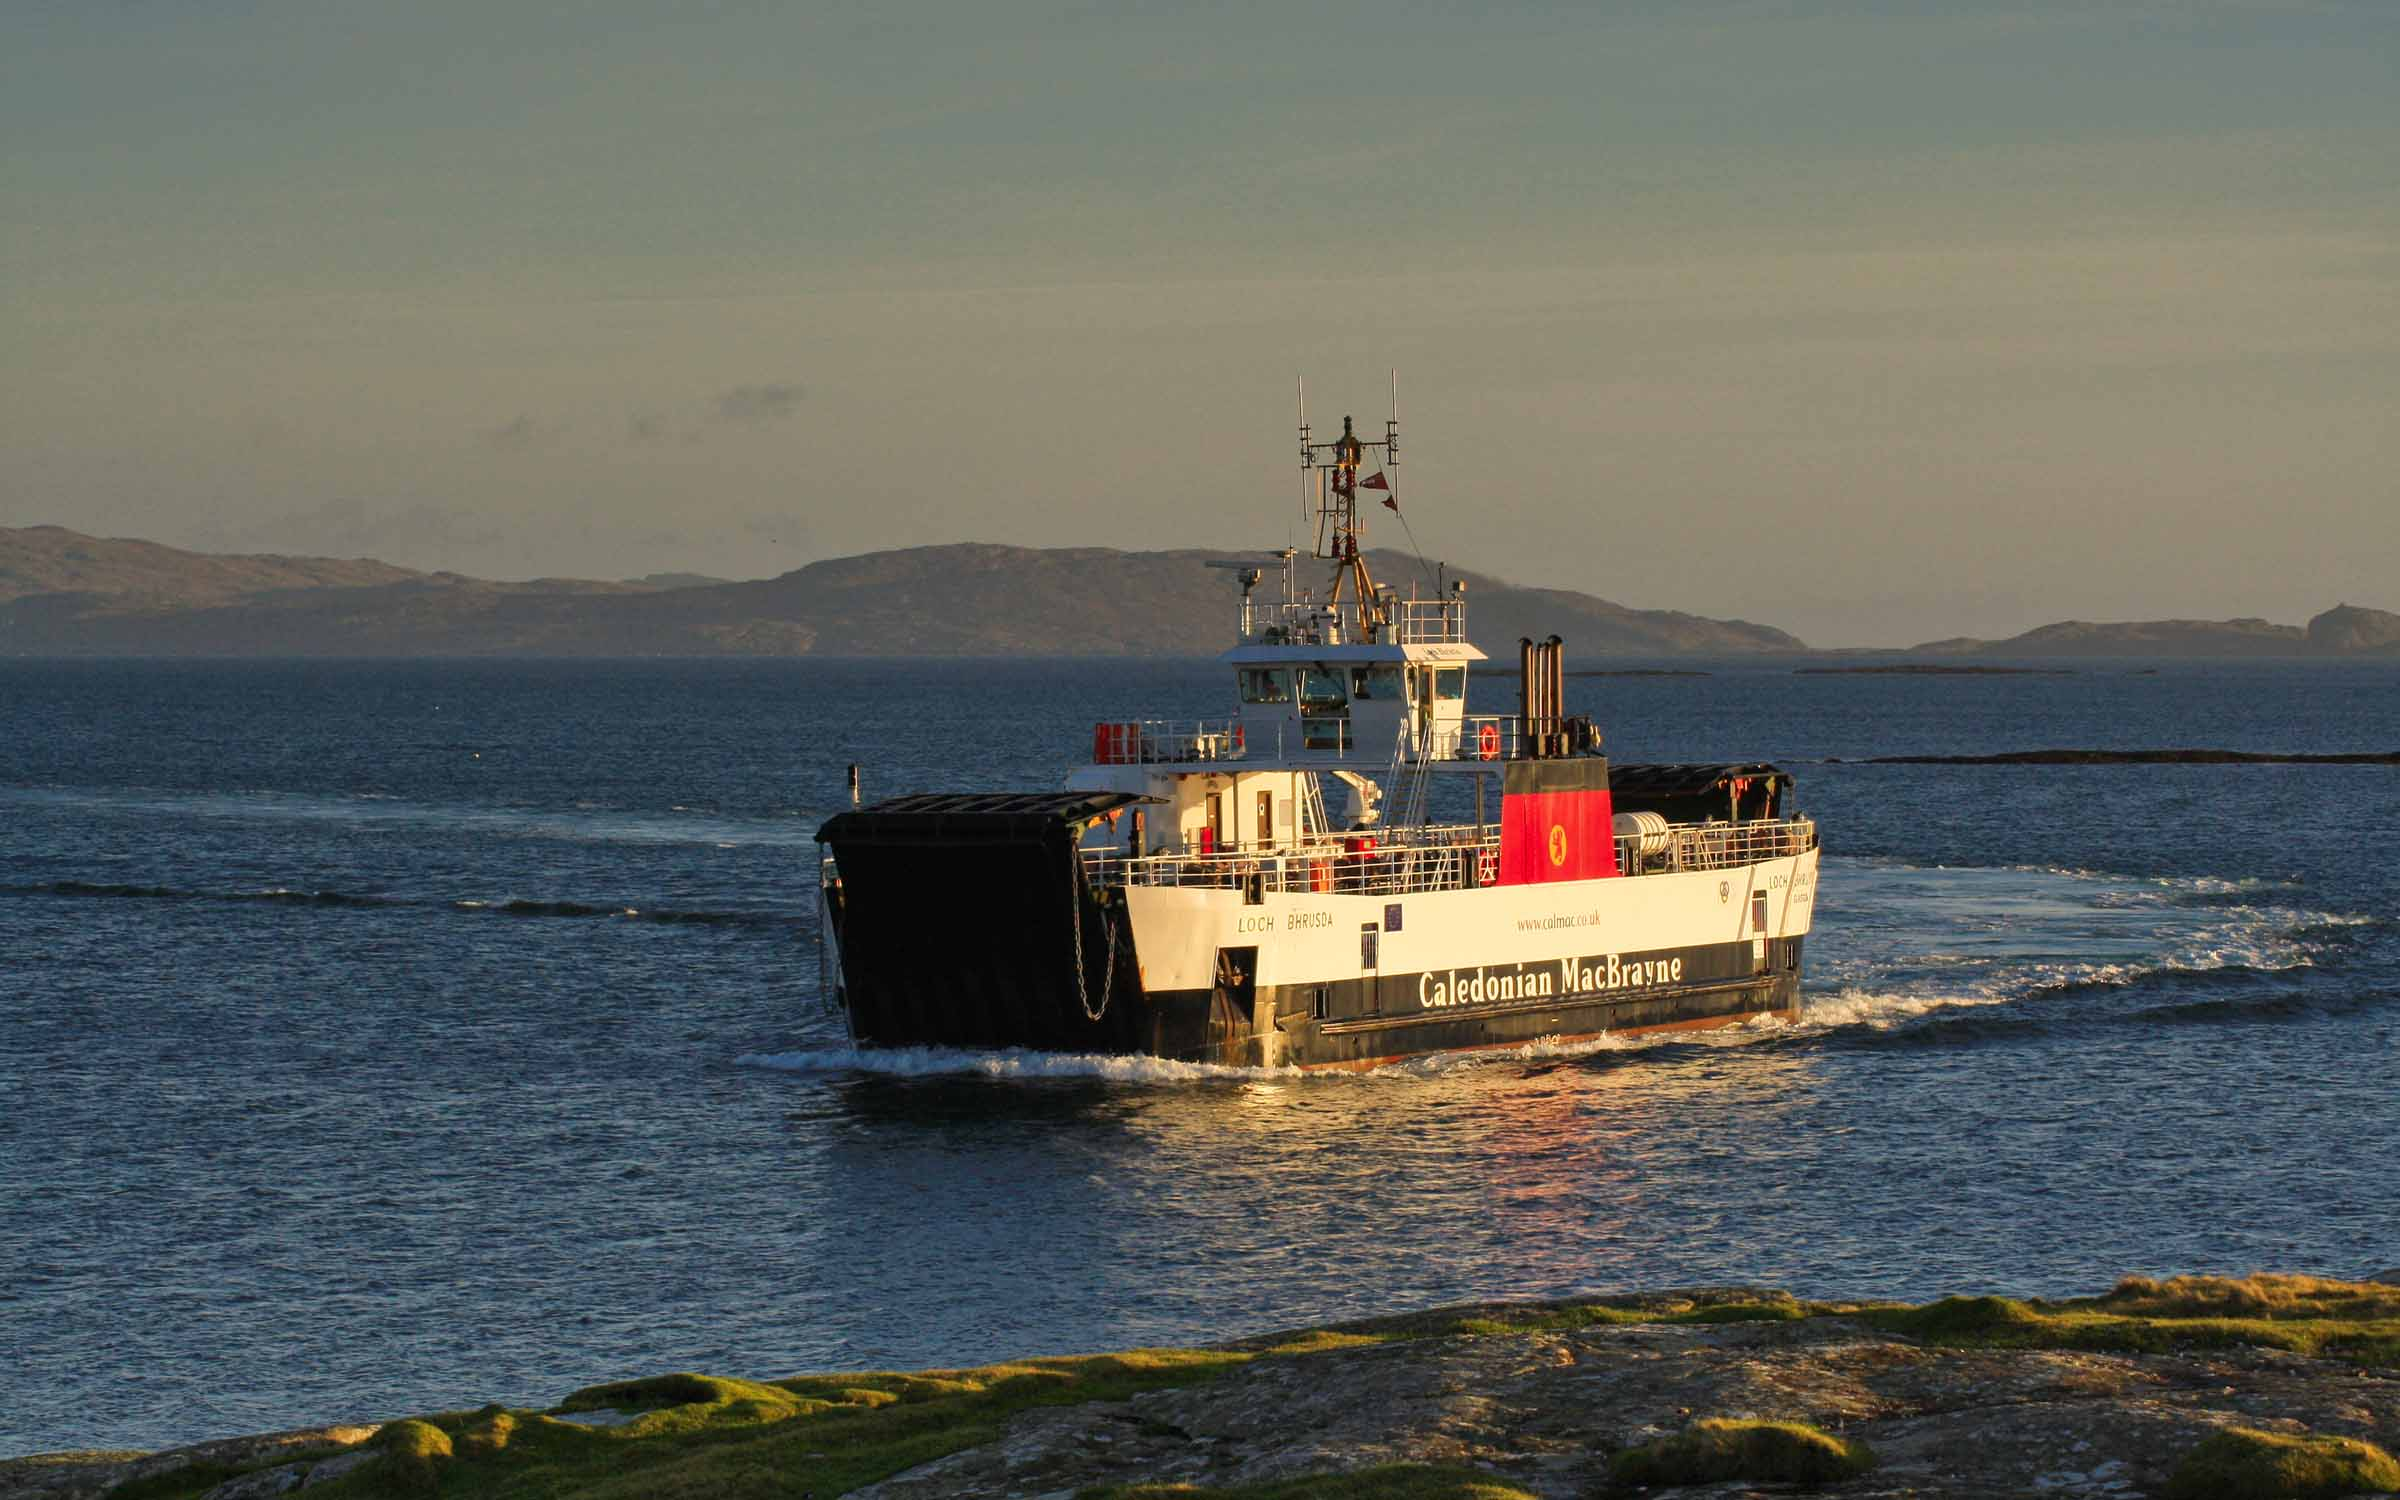 Loch Bhrusda arriving at Ardmhor (Ships of CalMac)